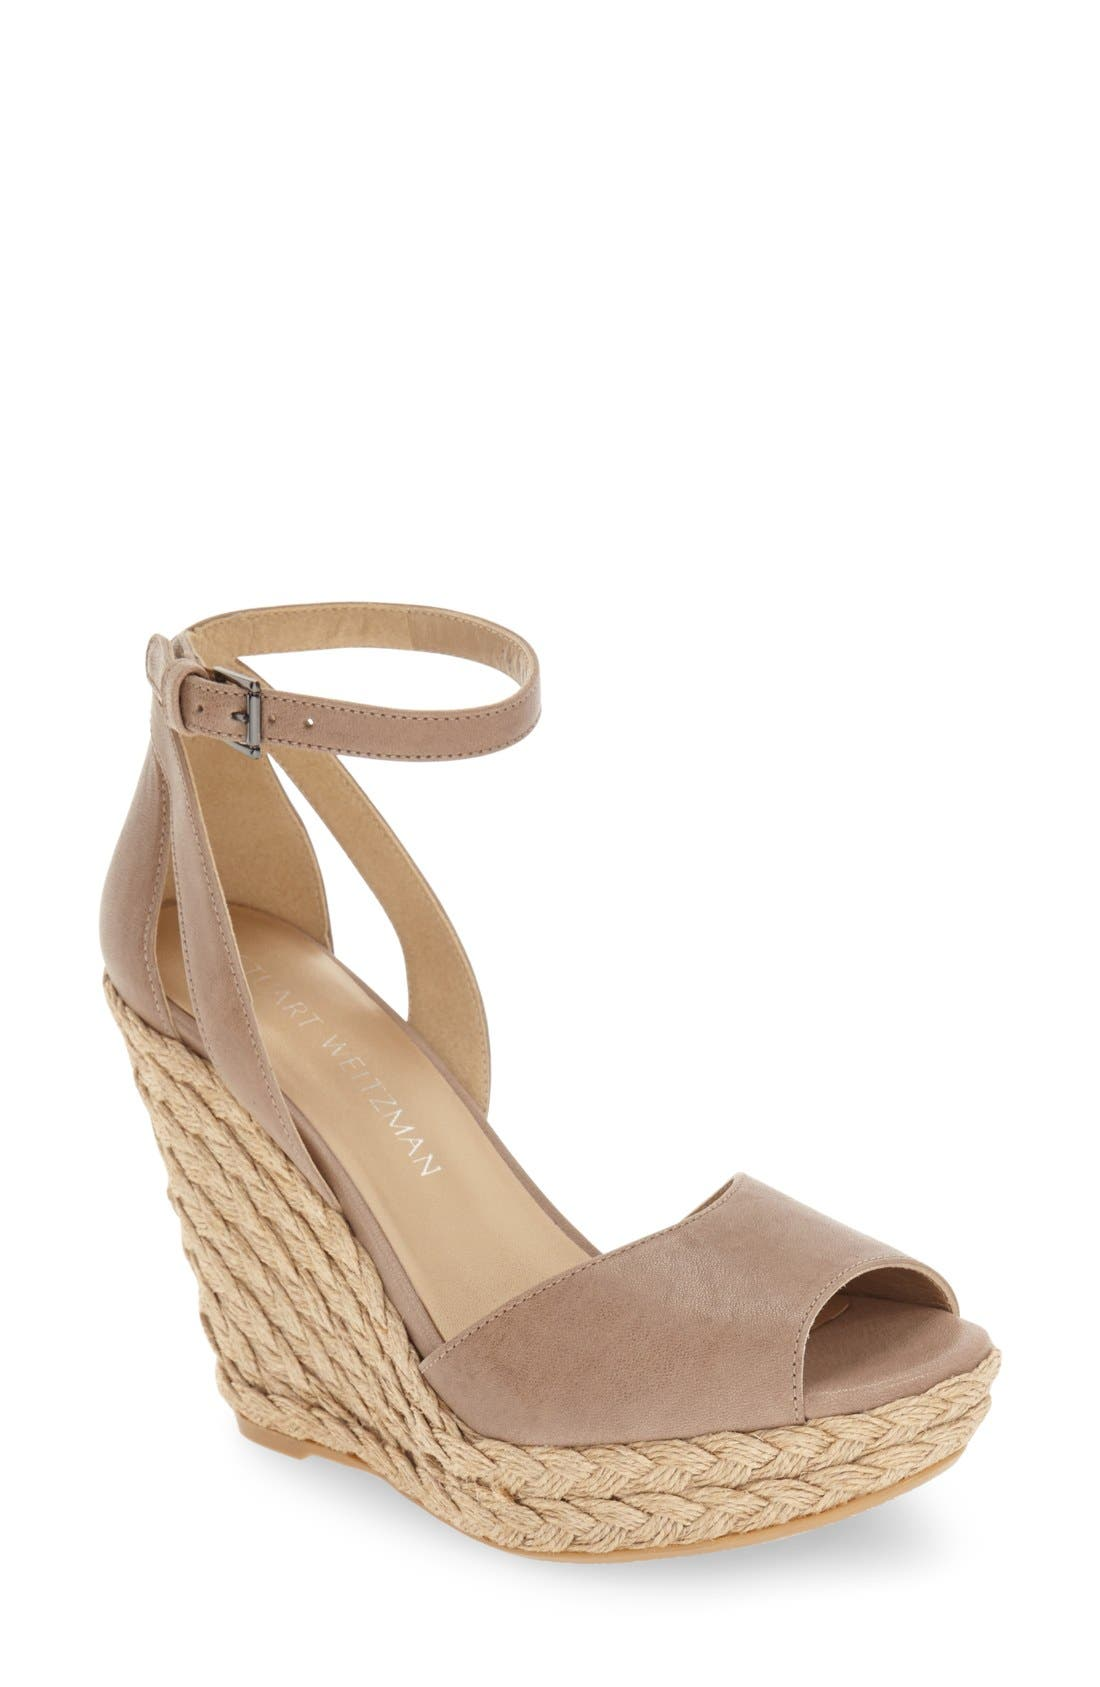 Alternate Image 1 Selected - Stuart Weitzman 'Hijinx' Espadrille Platform Wedge Sandal (Women)